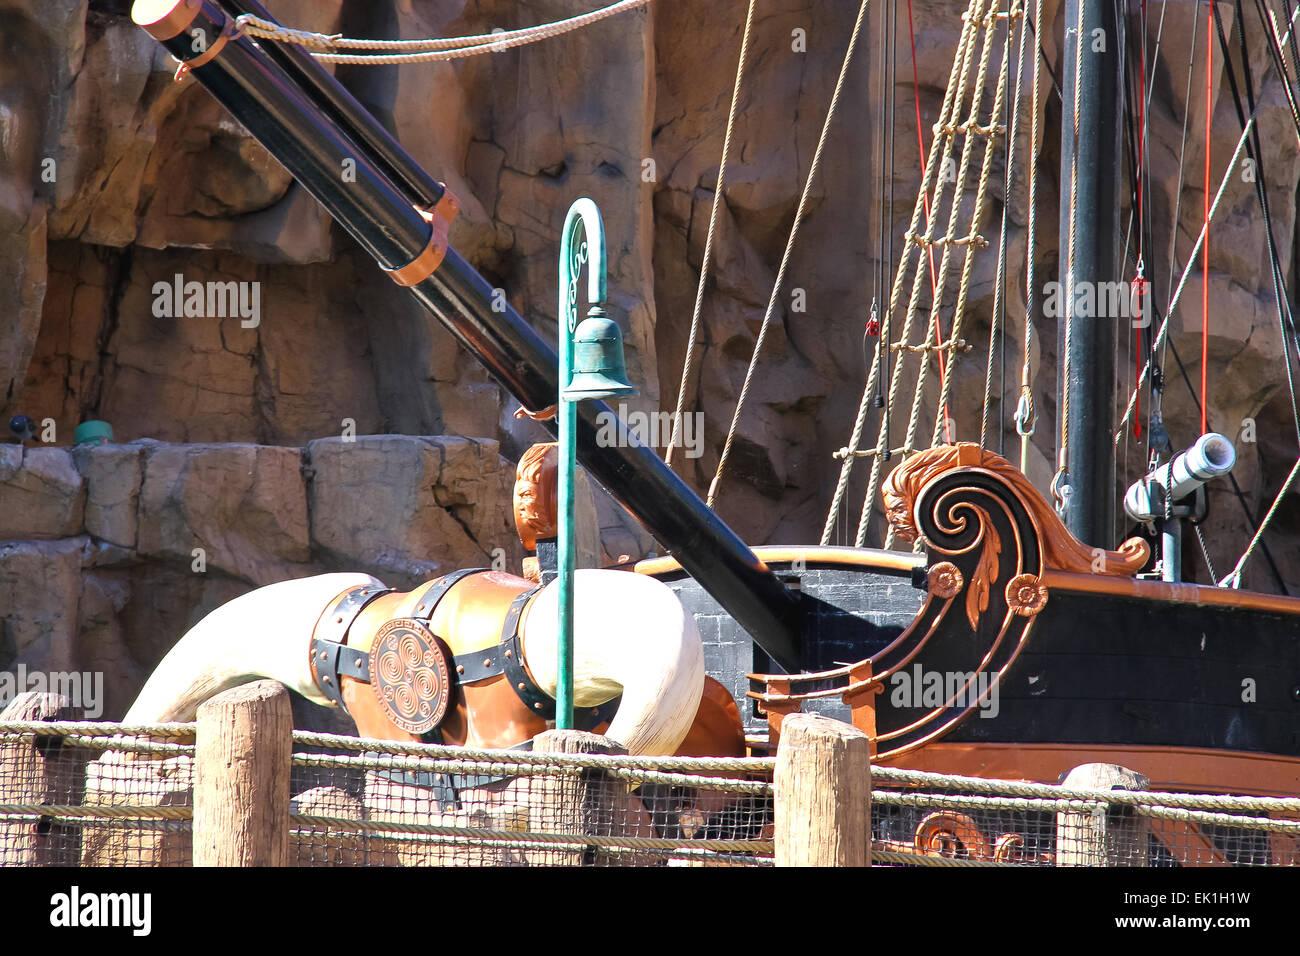 LAS VEGAS, NEVADA, USA - OCTOBER 20 : Pirate ship at pond near Treasure  Island hotel on October 20, 2013 in Las Vegas